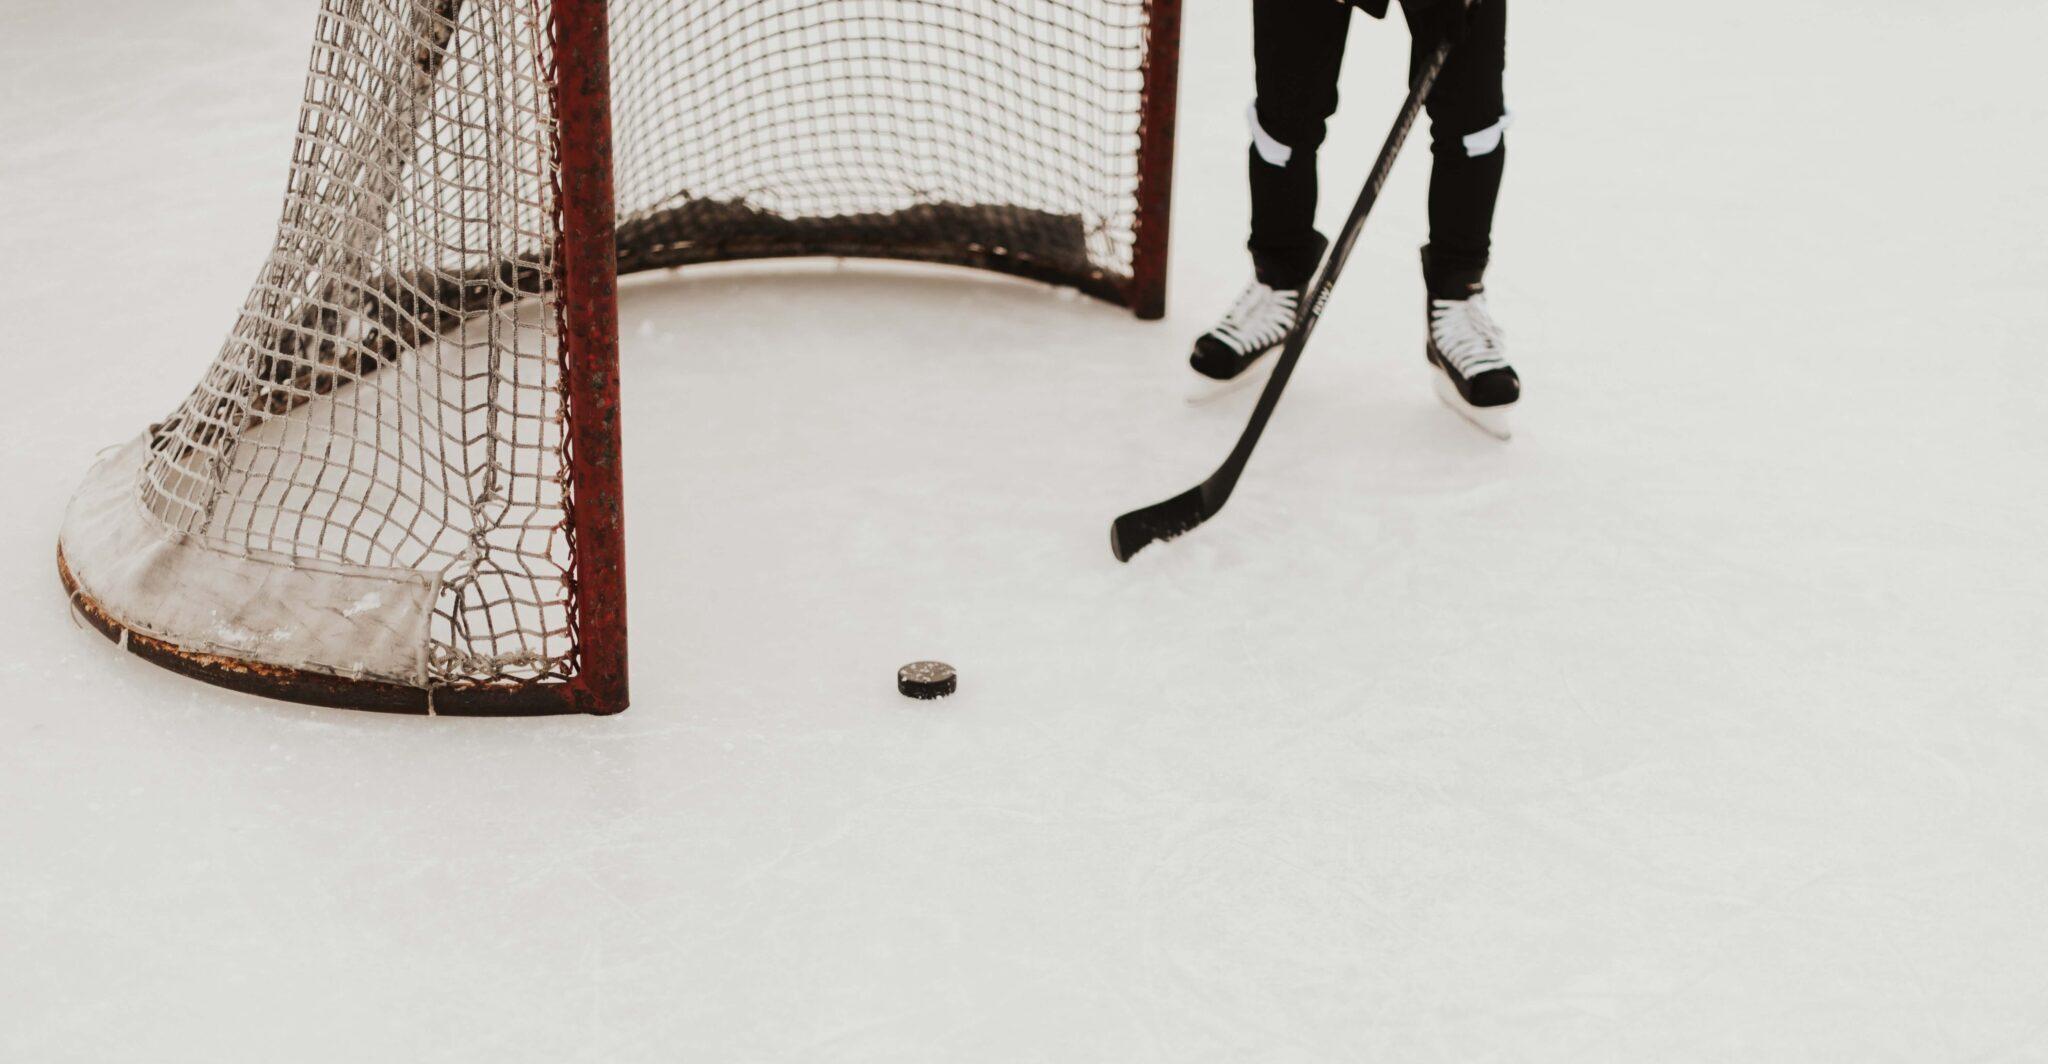 Hockey net and skater